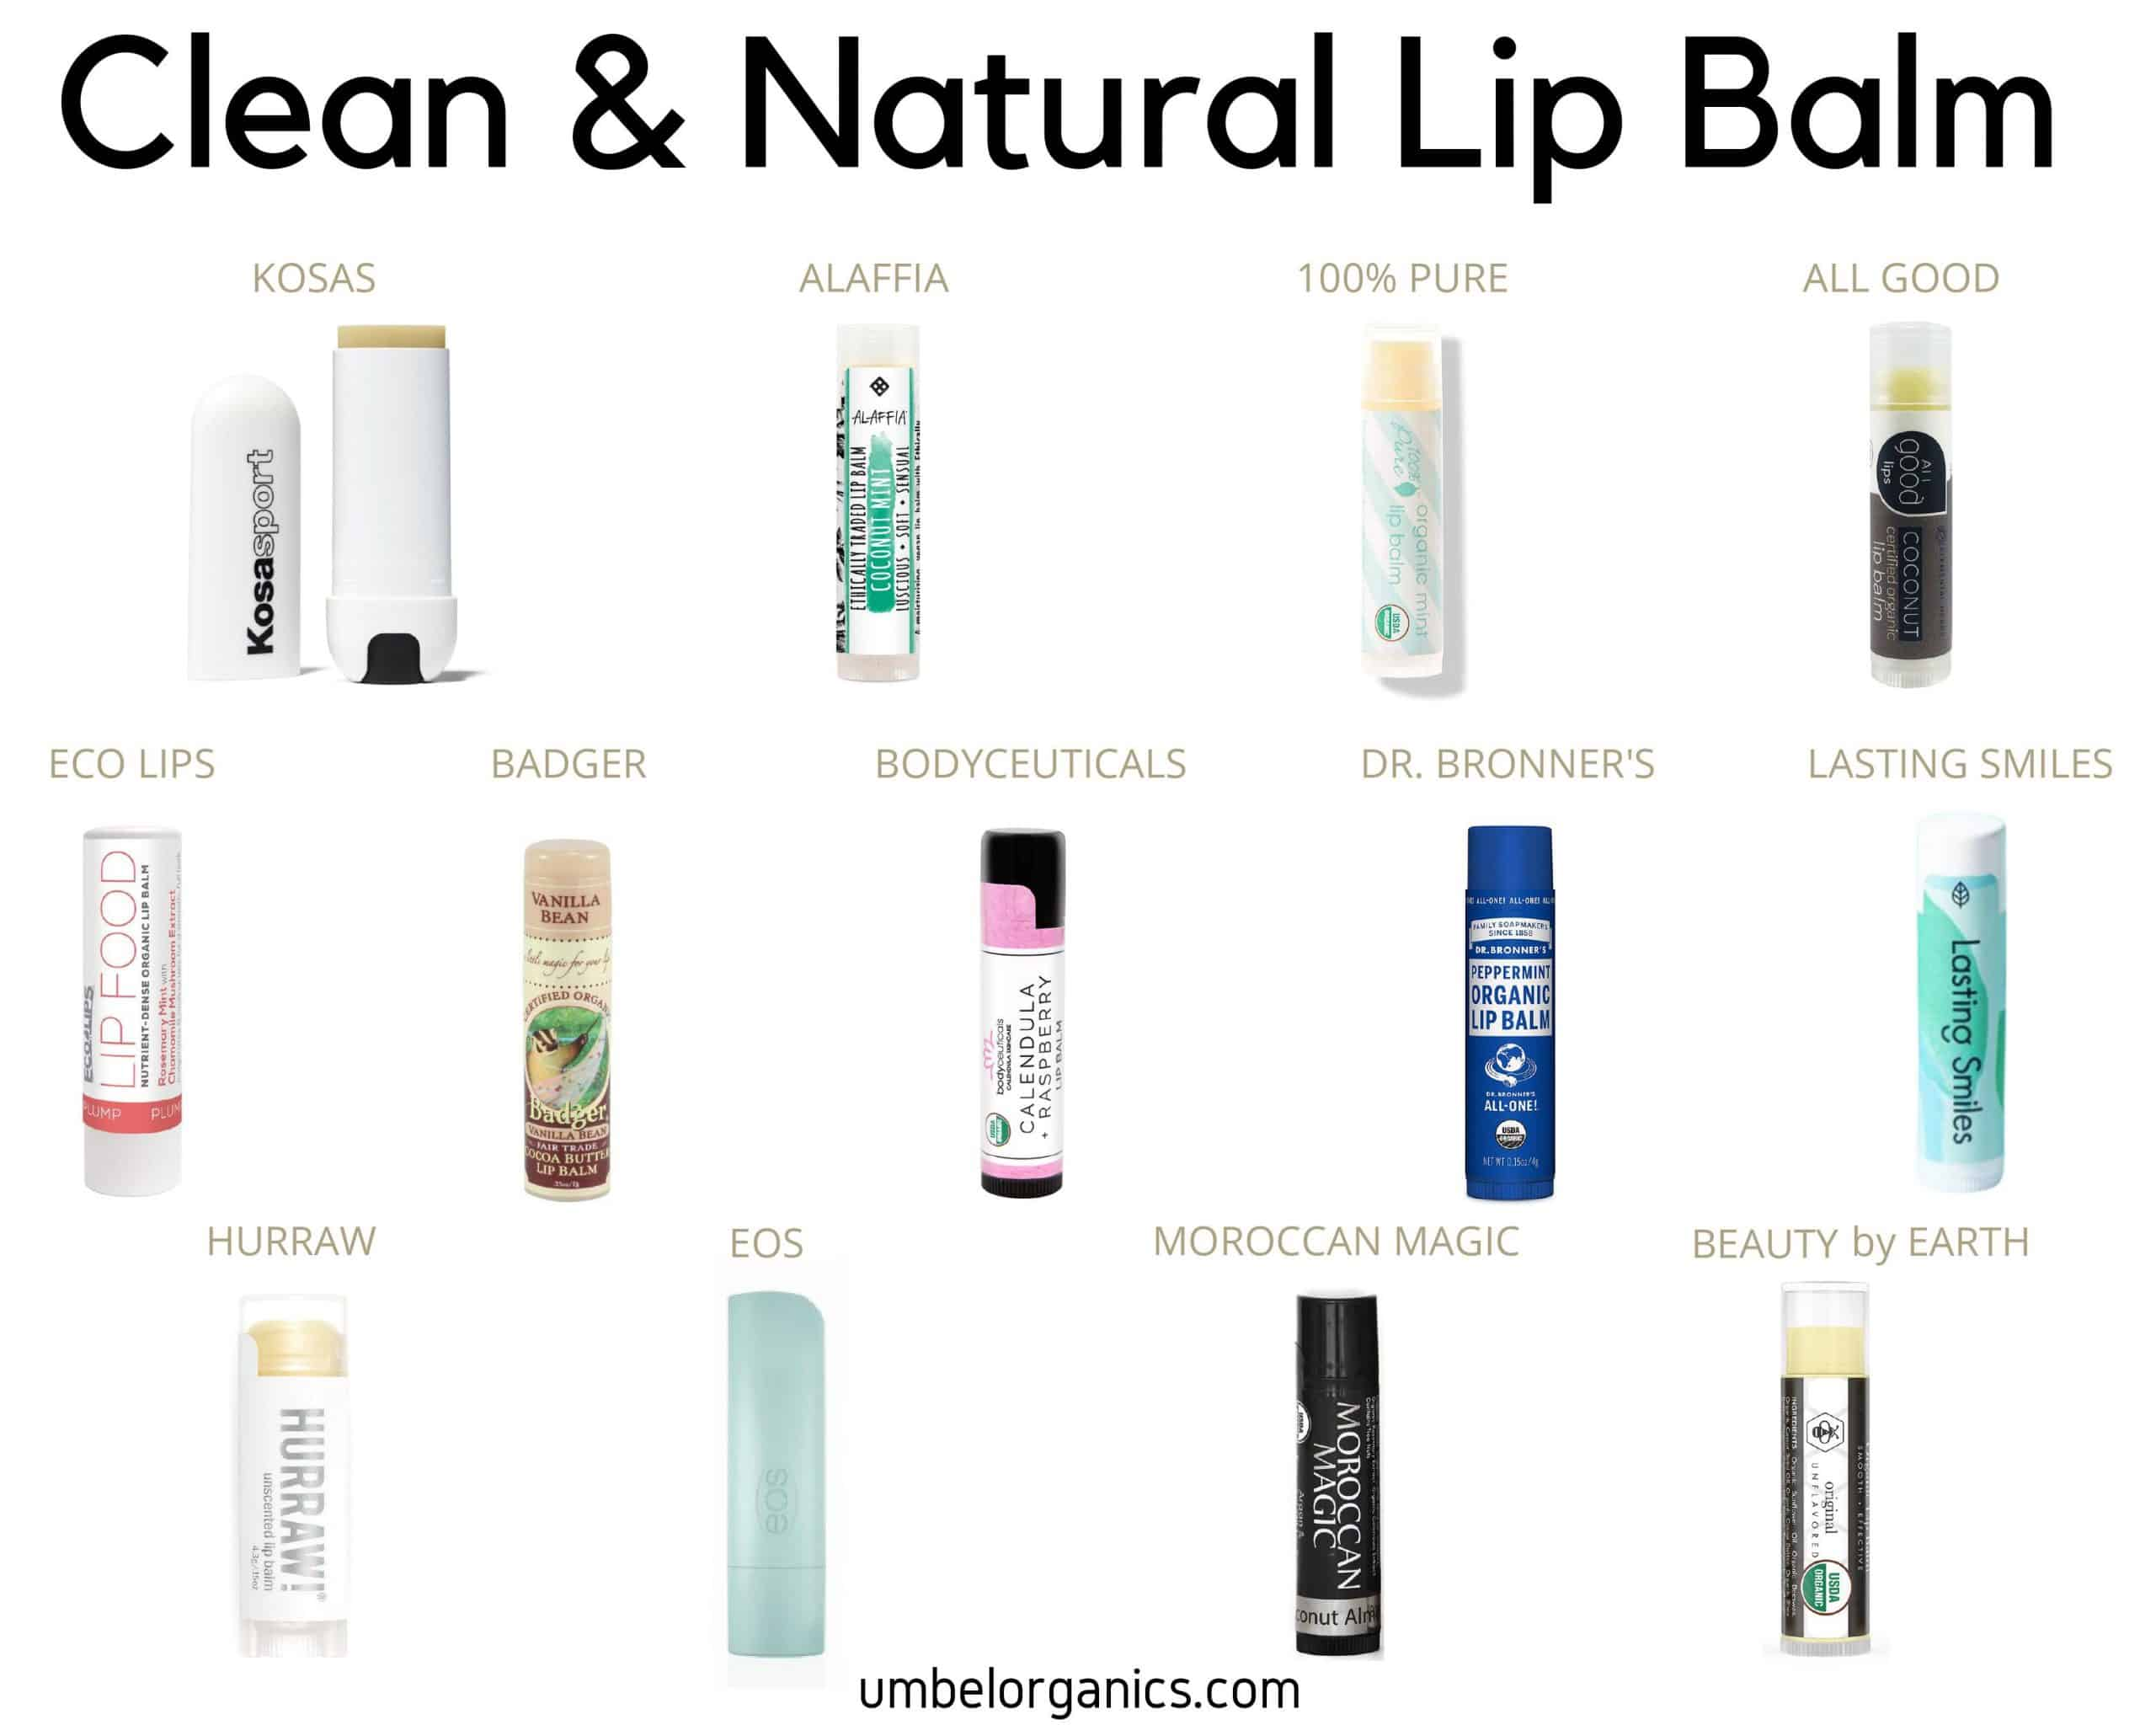 13 brands of Clean & Natural Lip Balm